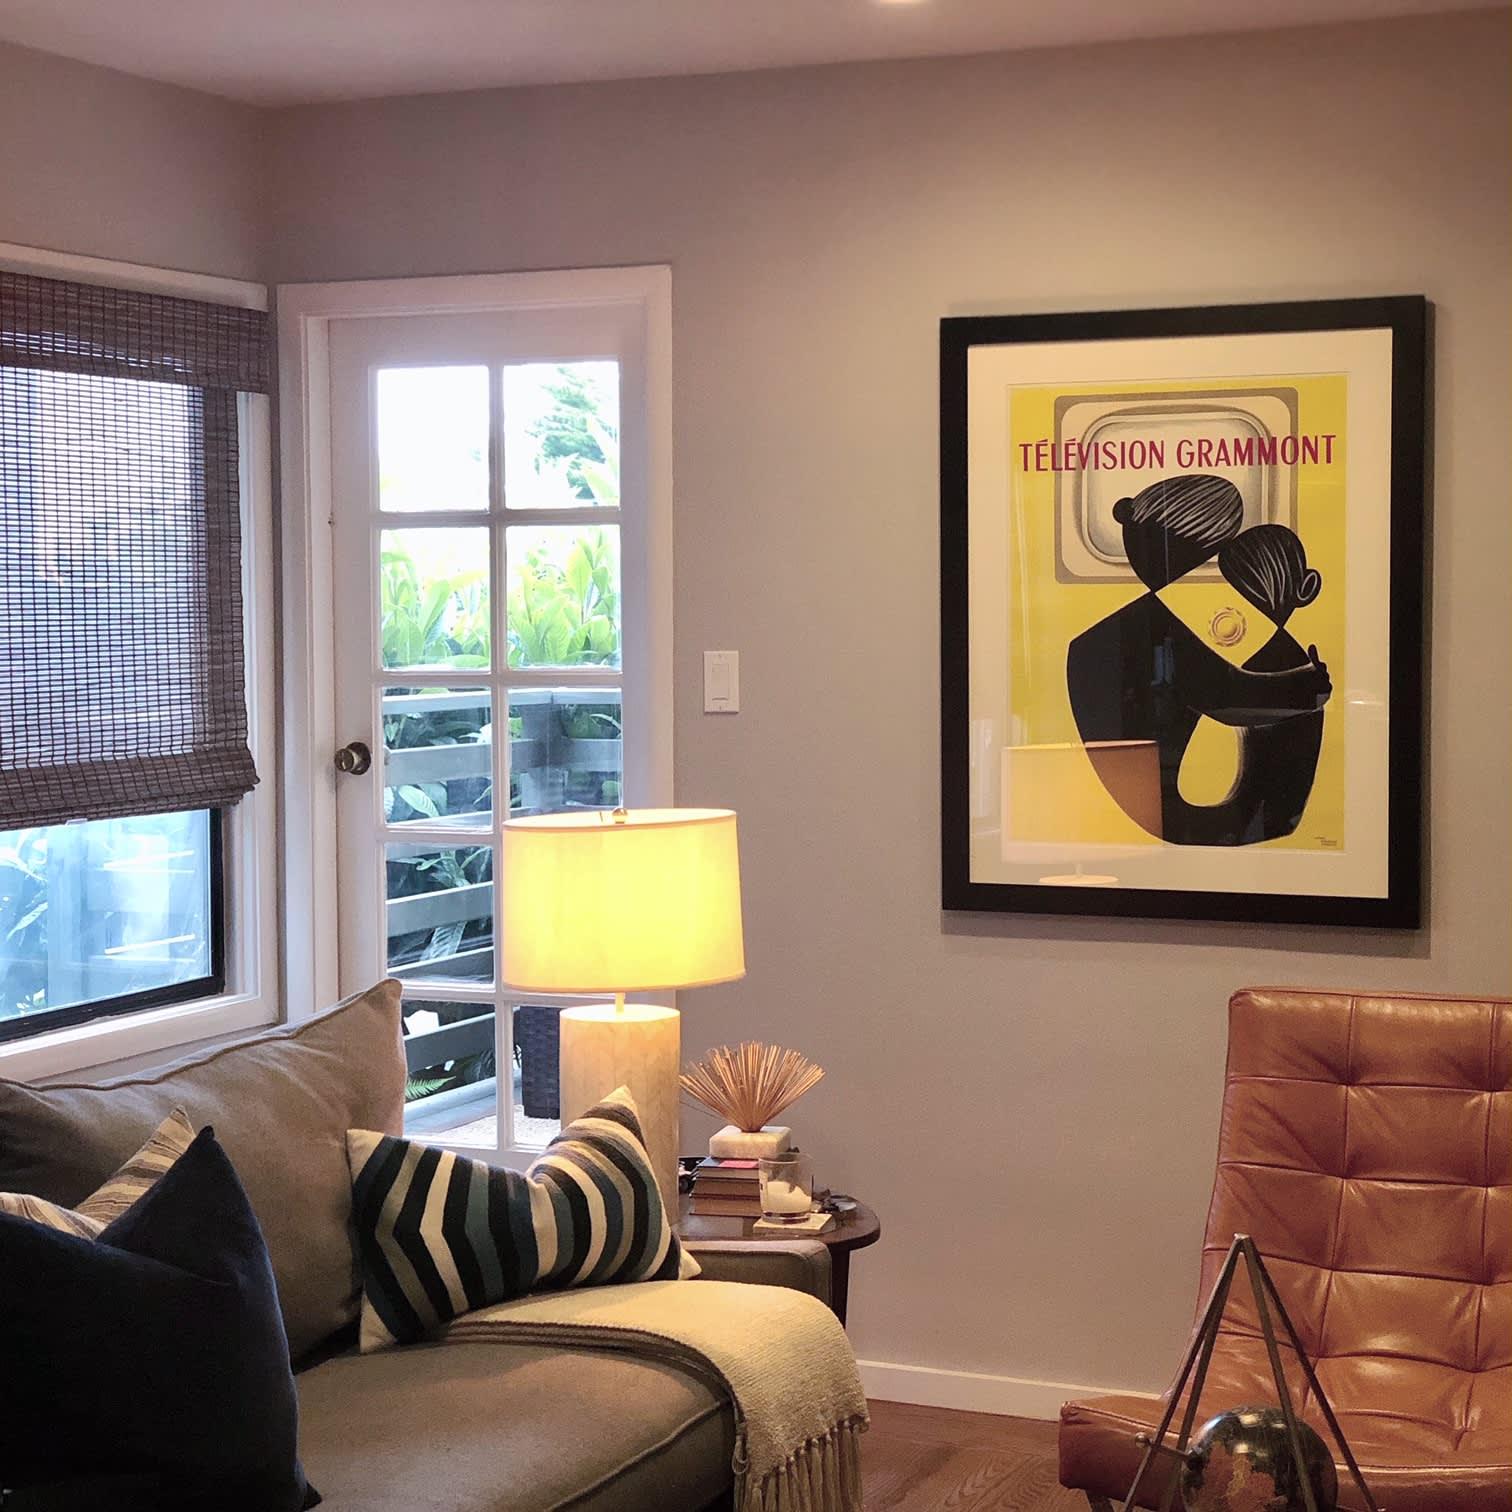 Mini Apartments In San Francisco: Small Condo New Traditional Decor Style Inspiration